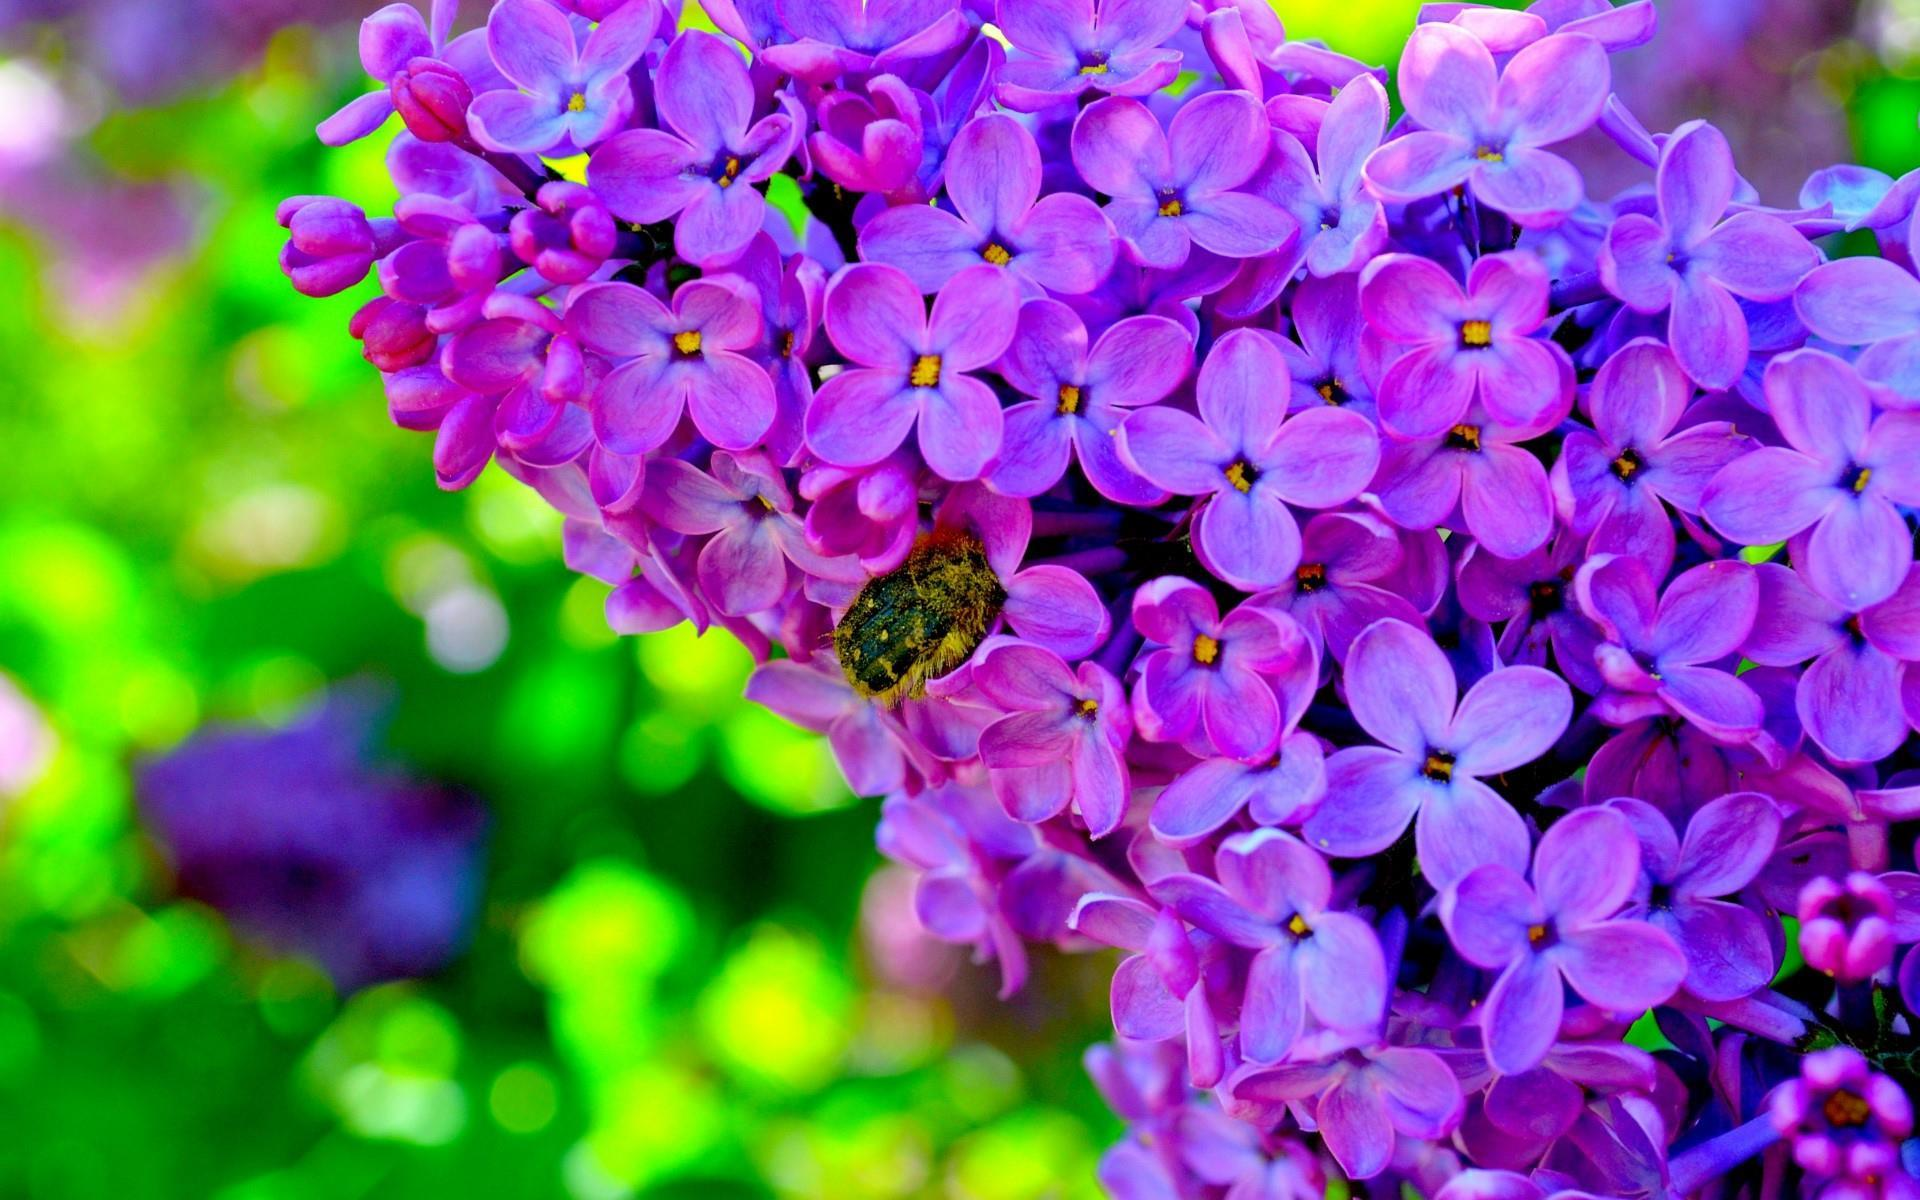 fleurs-en-fonds-ecran-HD-a-telecharger-gratuitement_4